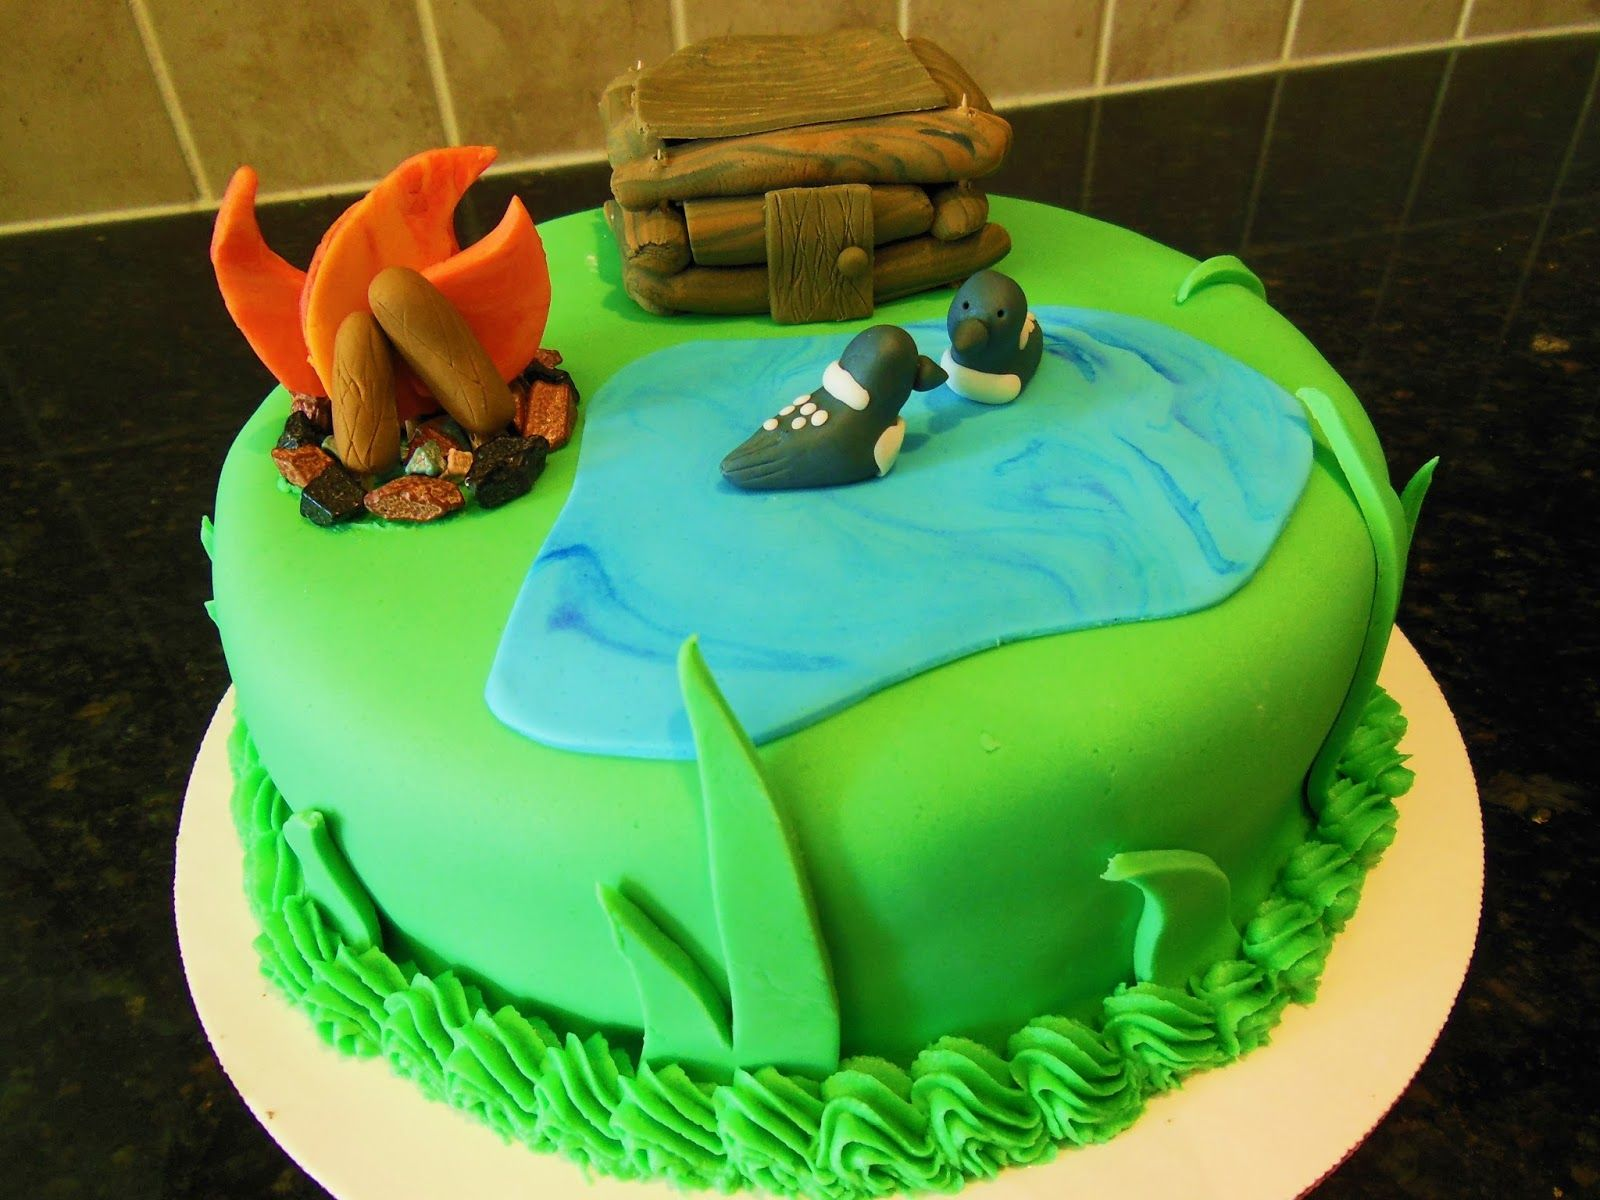 Camping cake. Cabin cake. Nature cake. Campfire cake